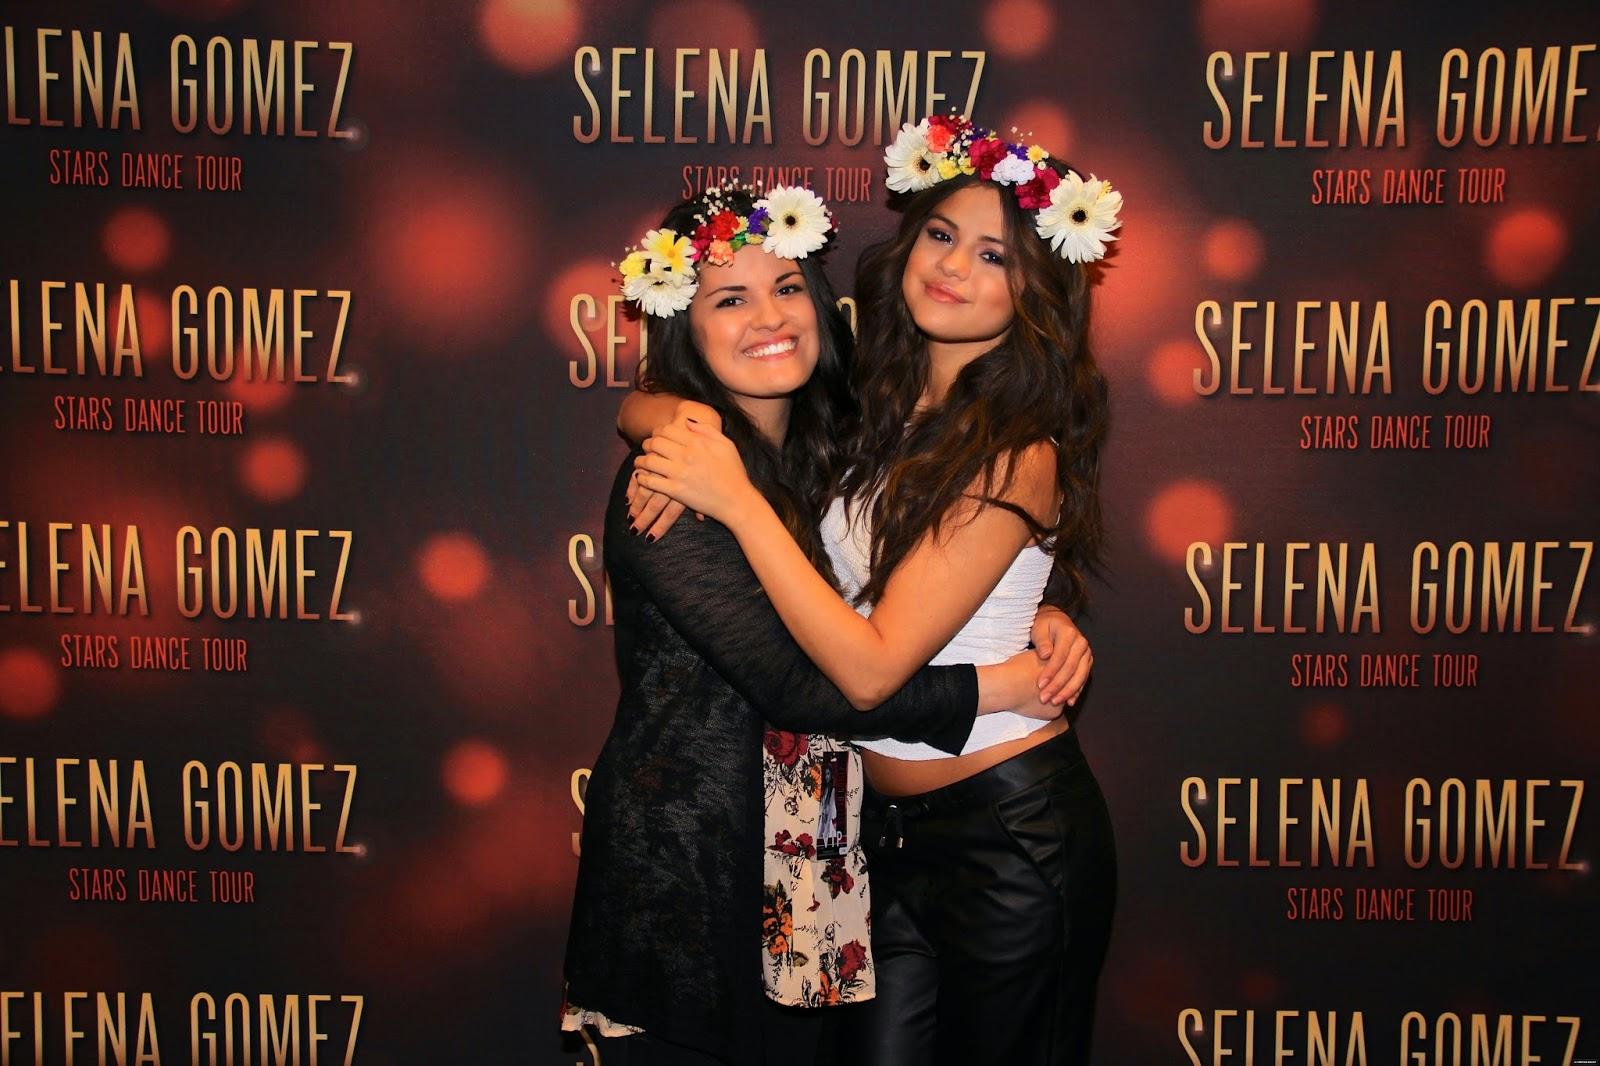 Selena gomez style stars dance world tour meet greet san jose stars dance world tour meet greet san jose california nov 10 2013 m4hsunfo